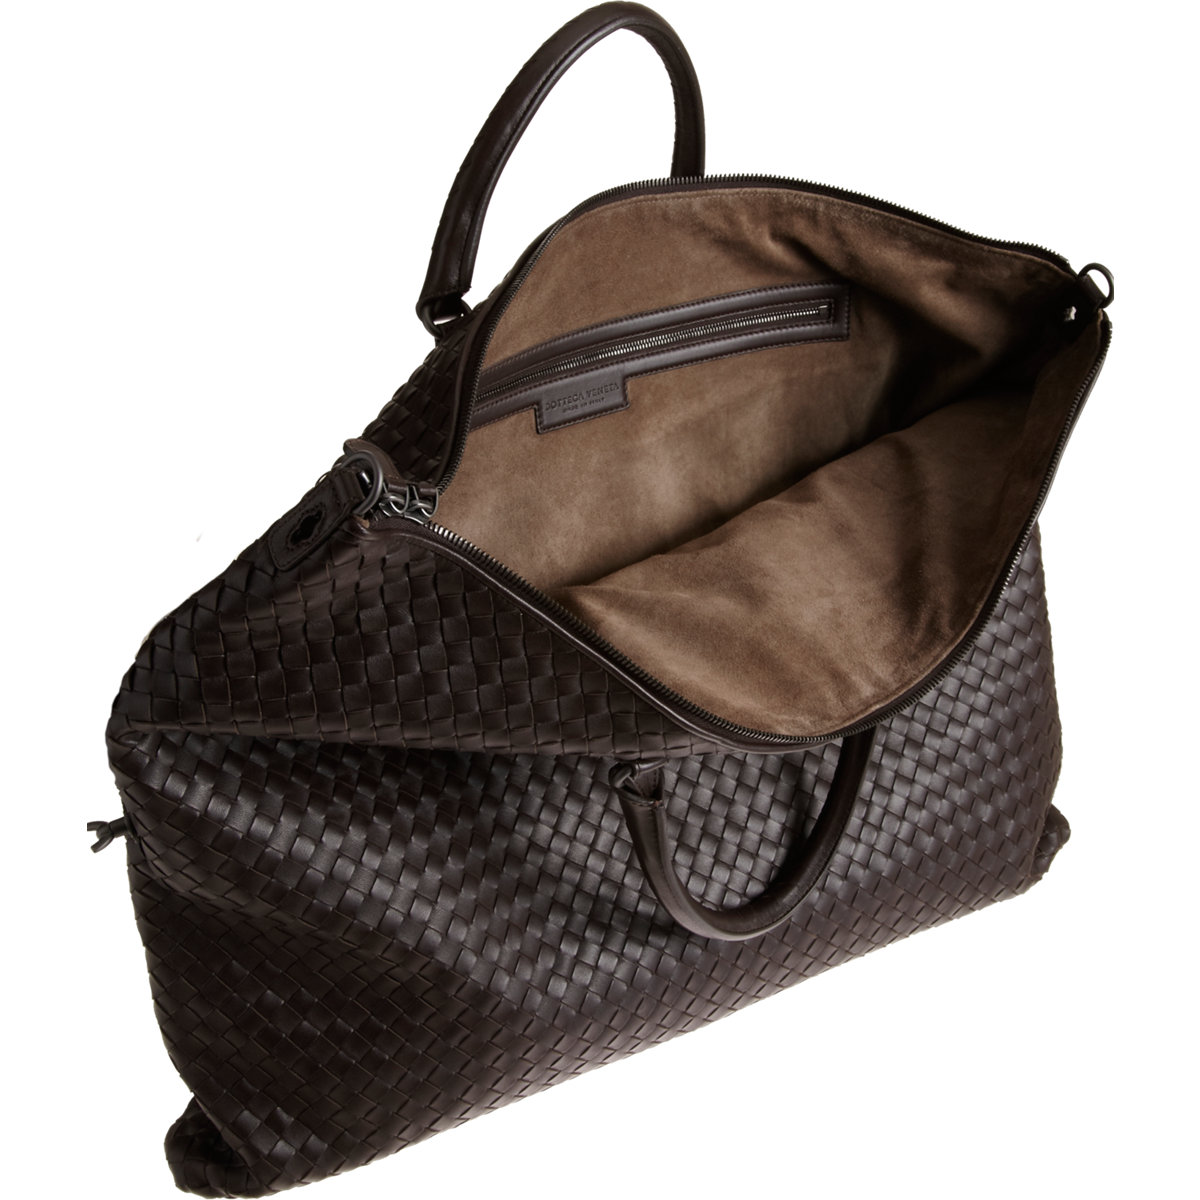 c828fdc7c426 Bottega Veneta Intrecciato Convertible Bag in Gray - Lyst